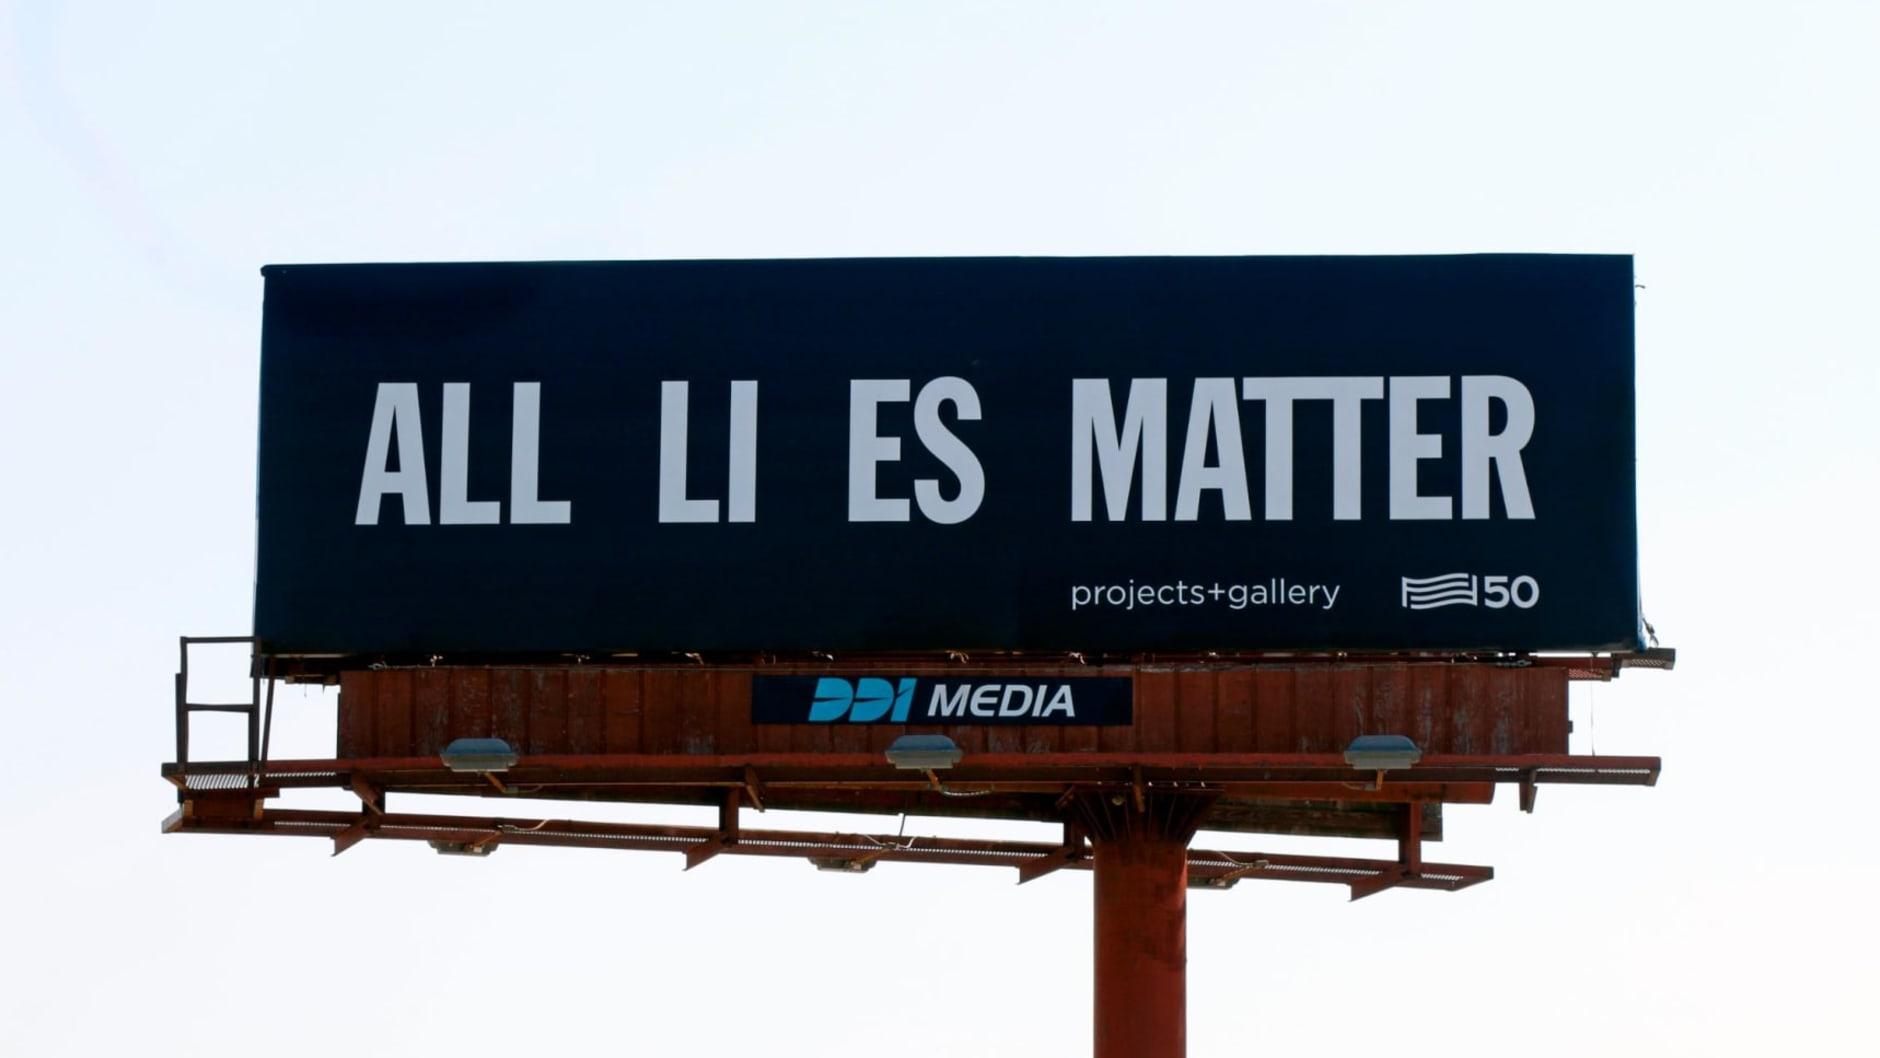 http%3A%2F%2Fcdn.cnn.com%2Fcnnnext%2Fdam%2Fassets%2F180927155906-for-freedoms-billboard.jpg